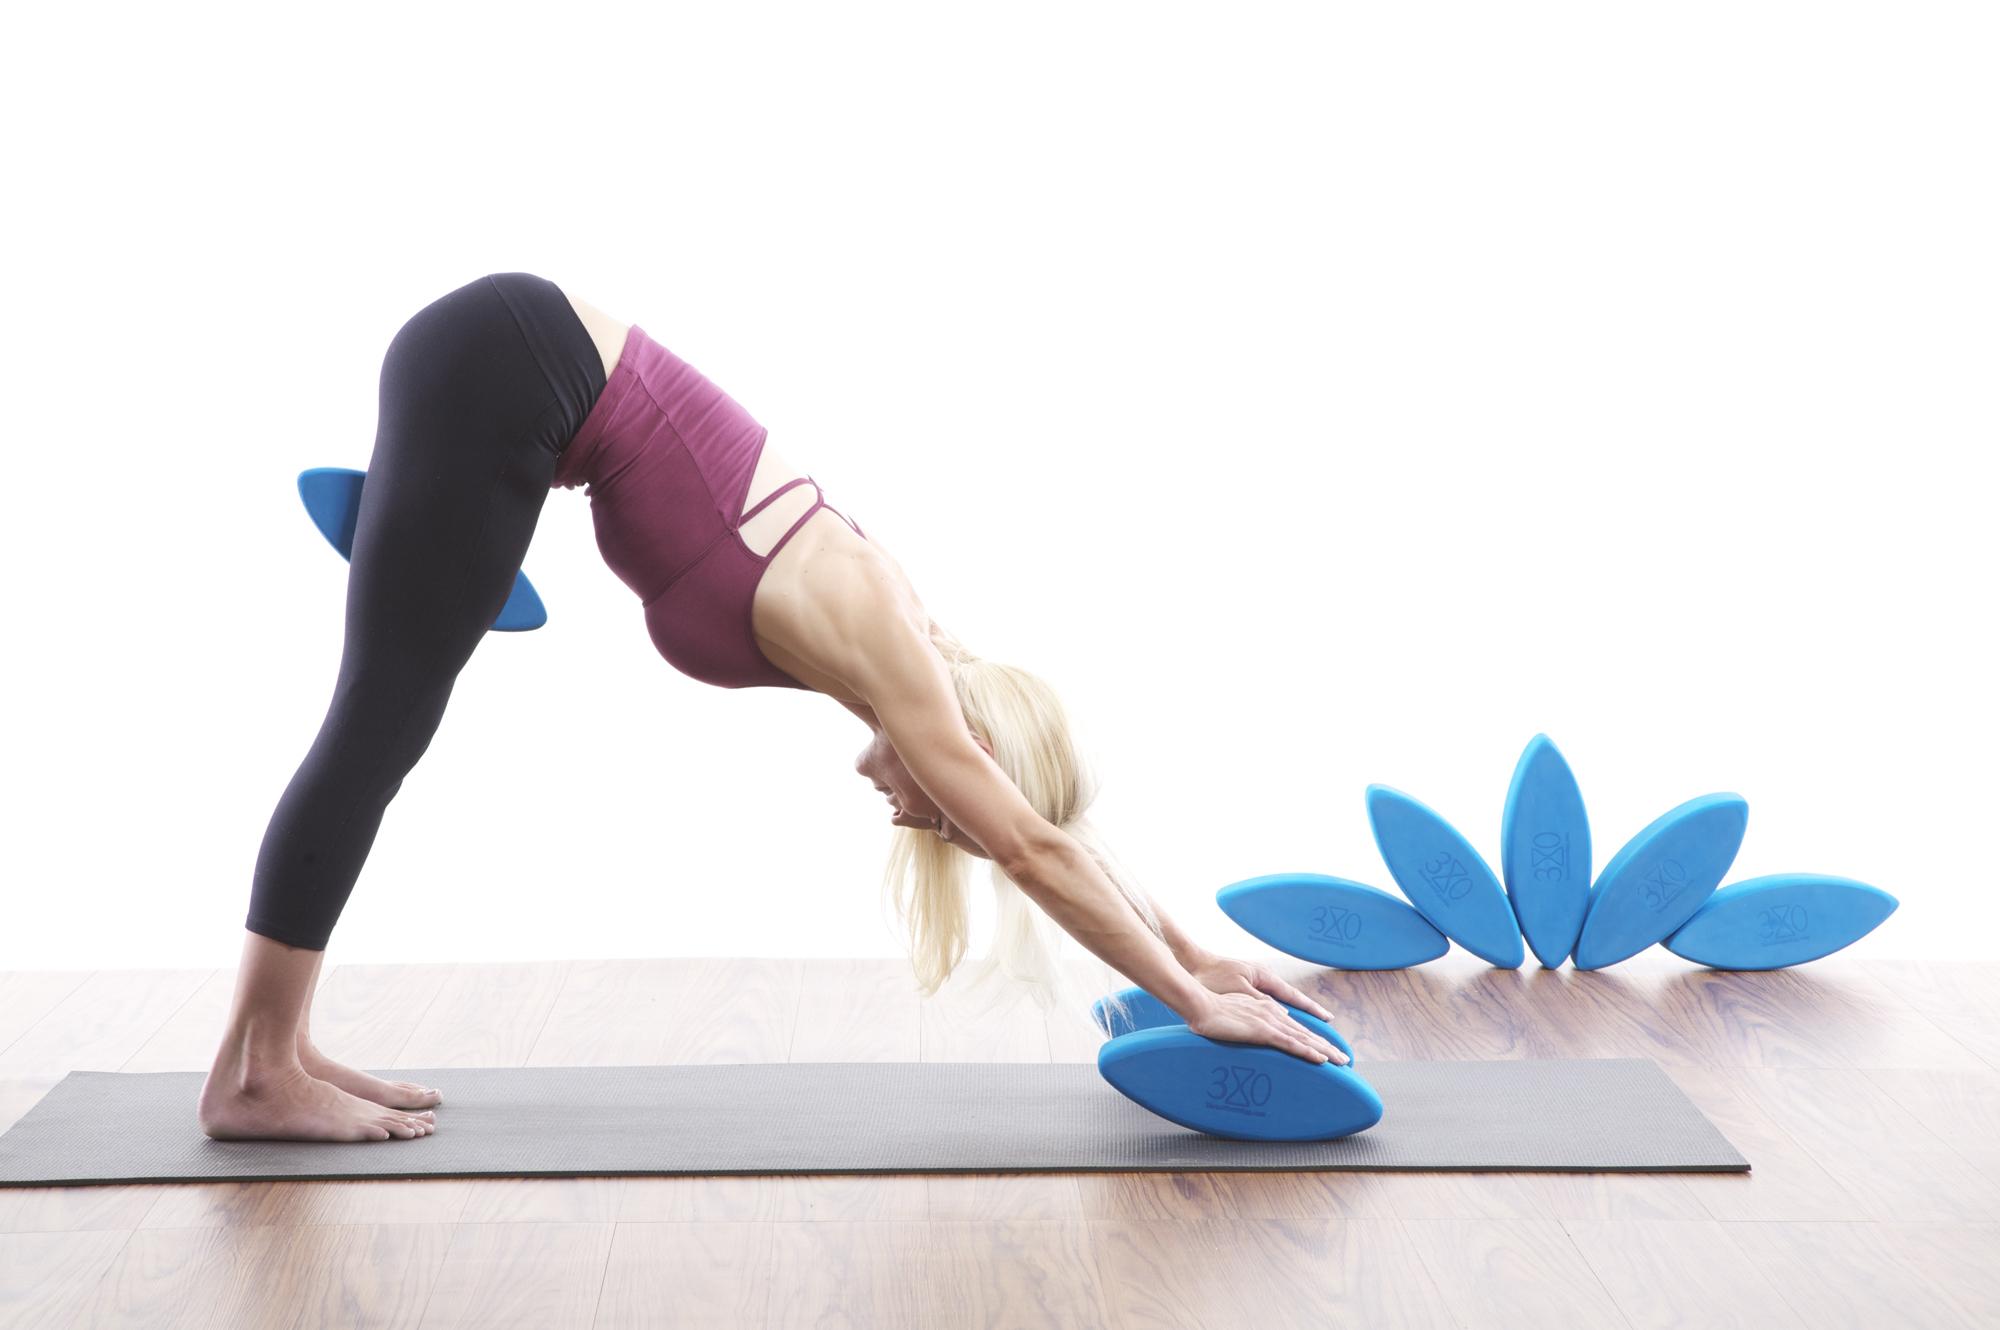 Using Ergonomic Yoga Blocks By Three Minute Egg To